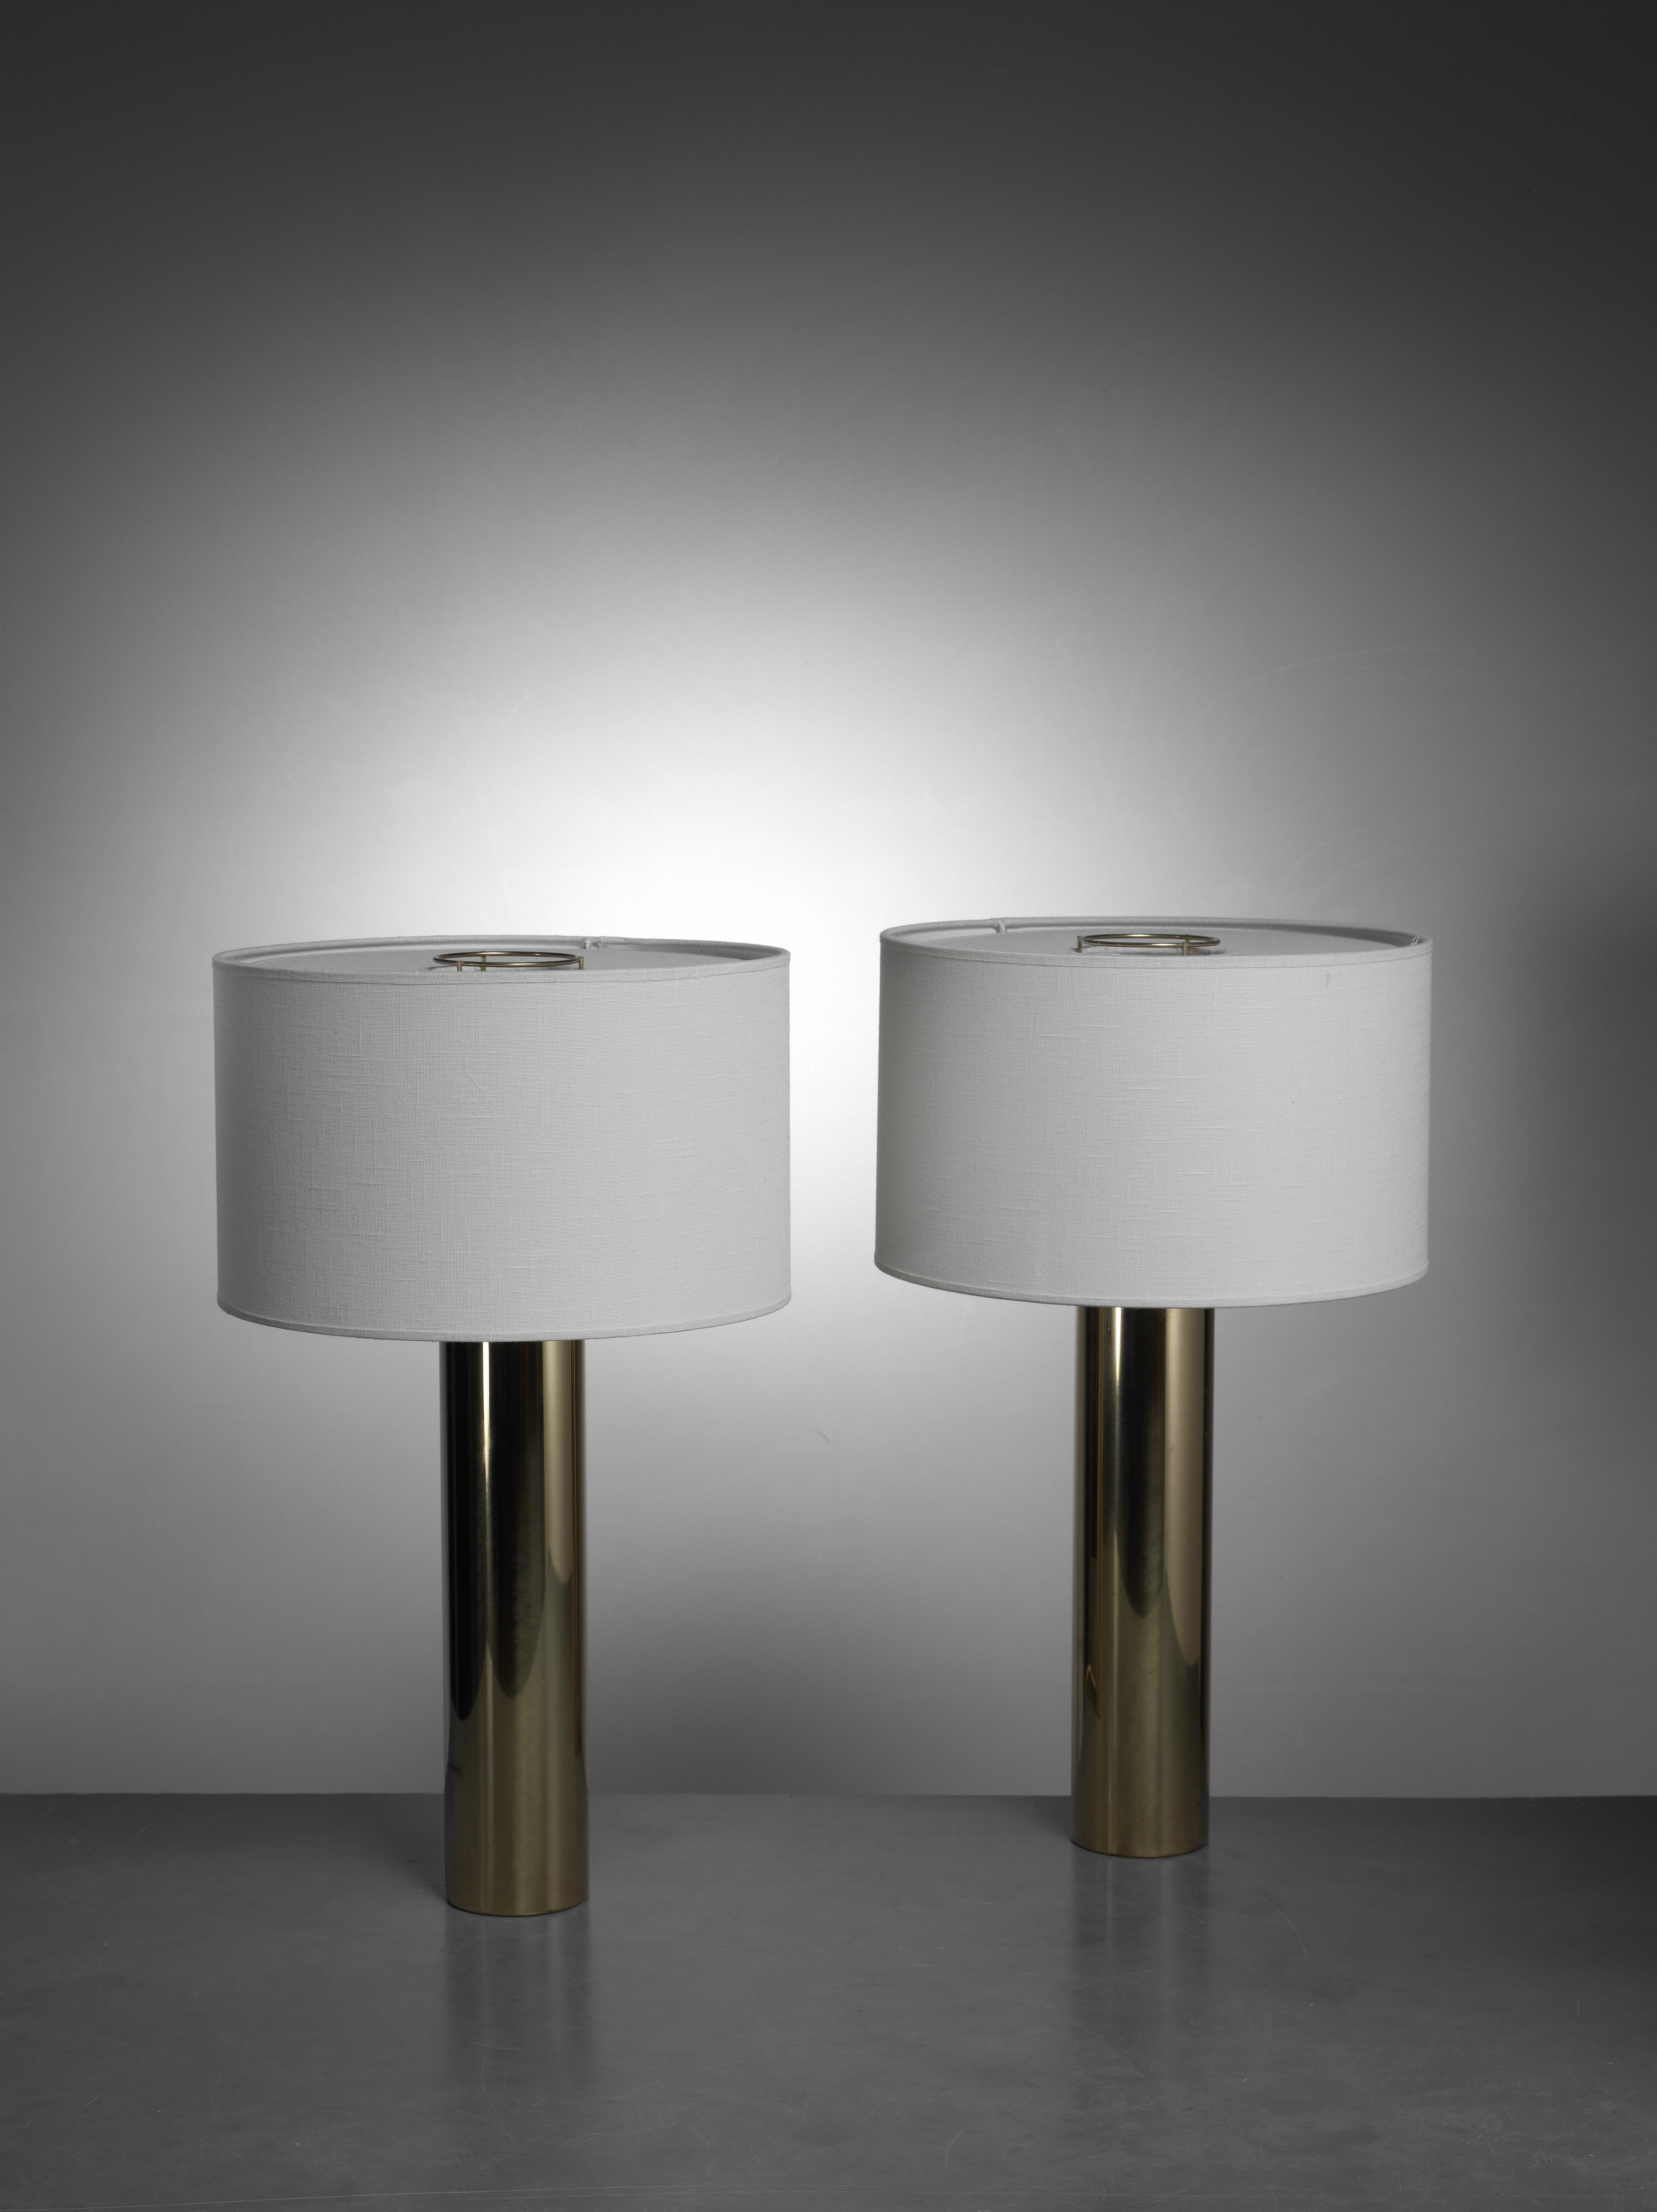 Falkenberg Brass Table Lamps, Sweden, 1950s   Image 3 Of 3